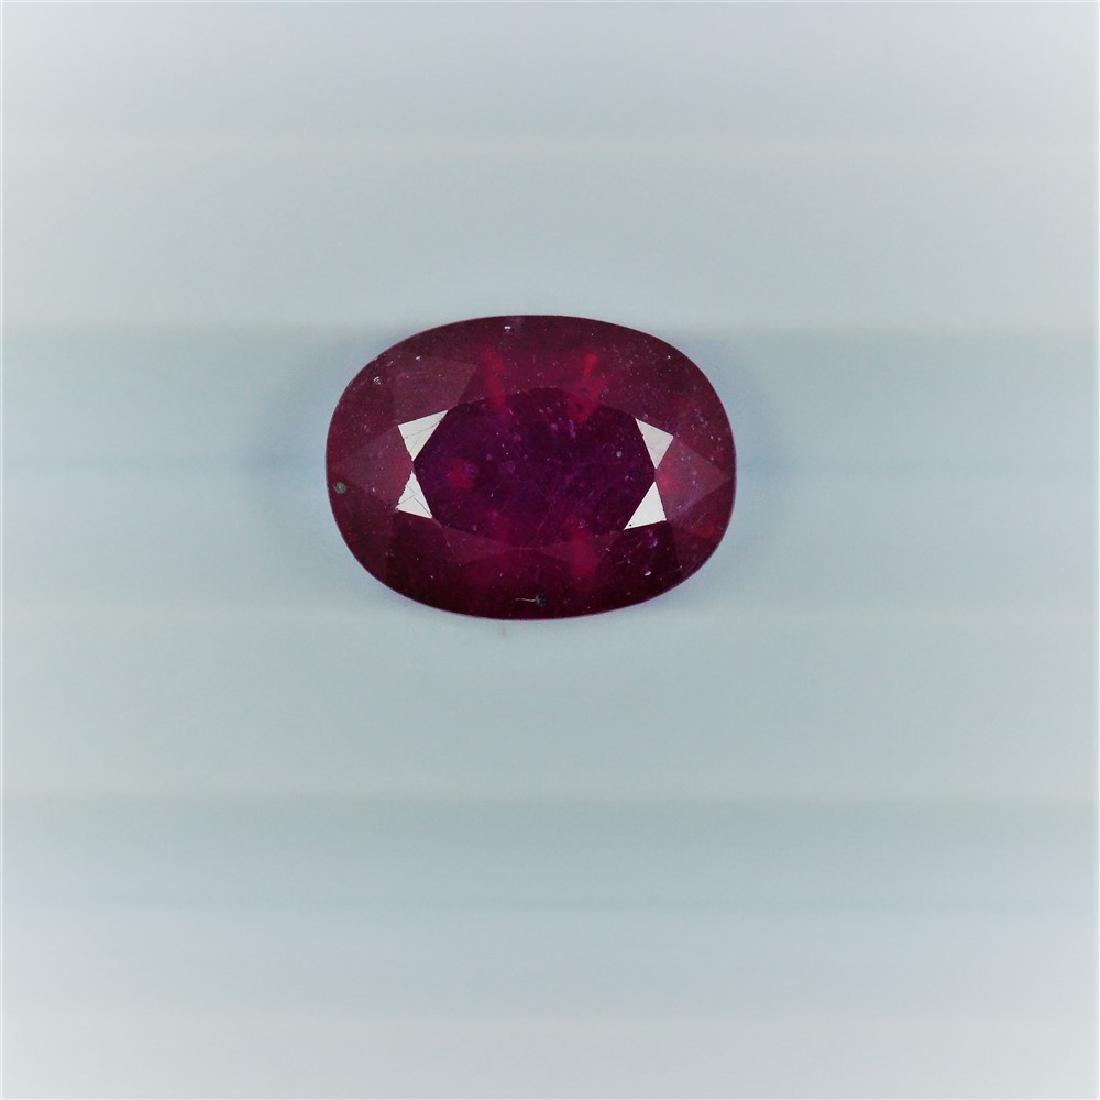 4.81 Carat Loose Ruby Oval cut